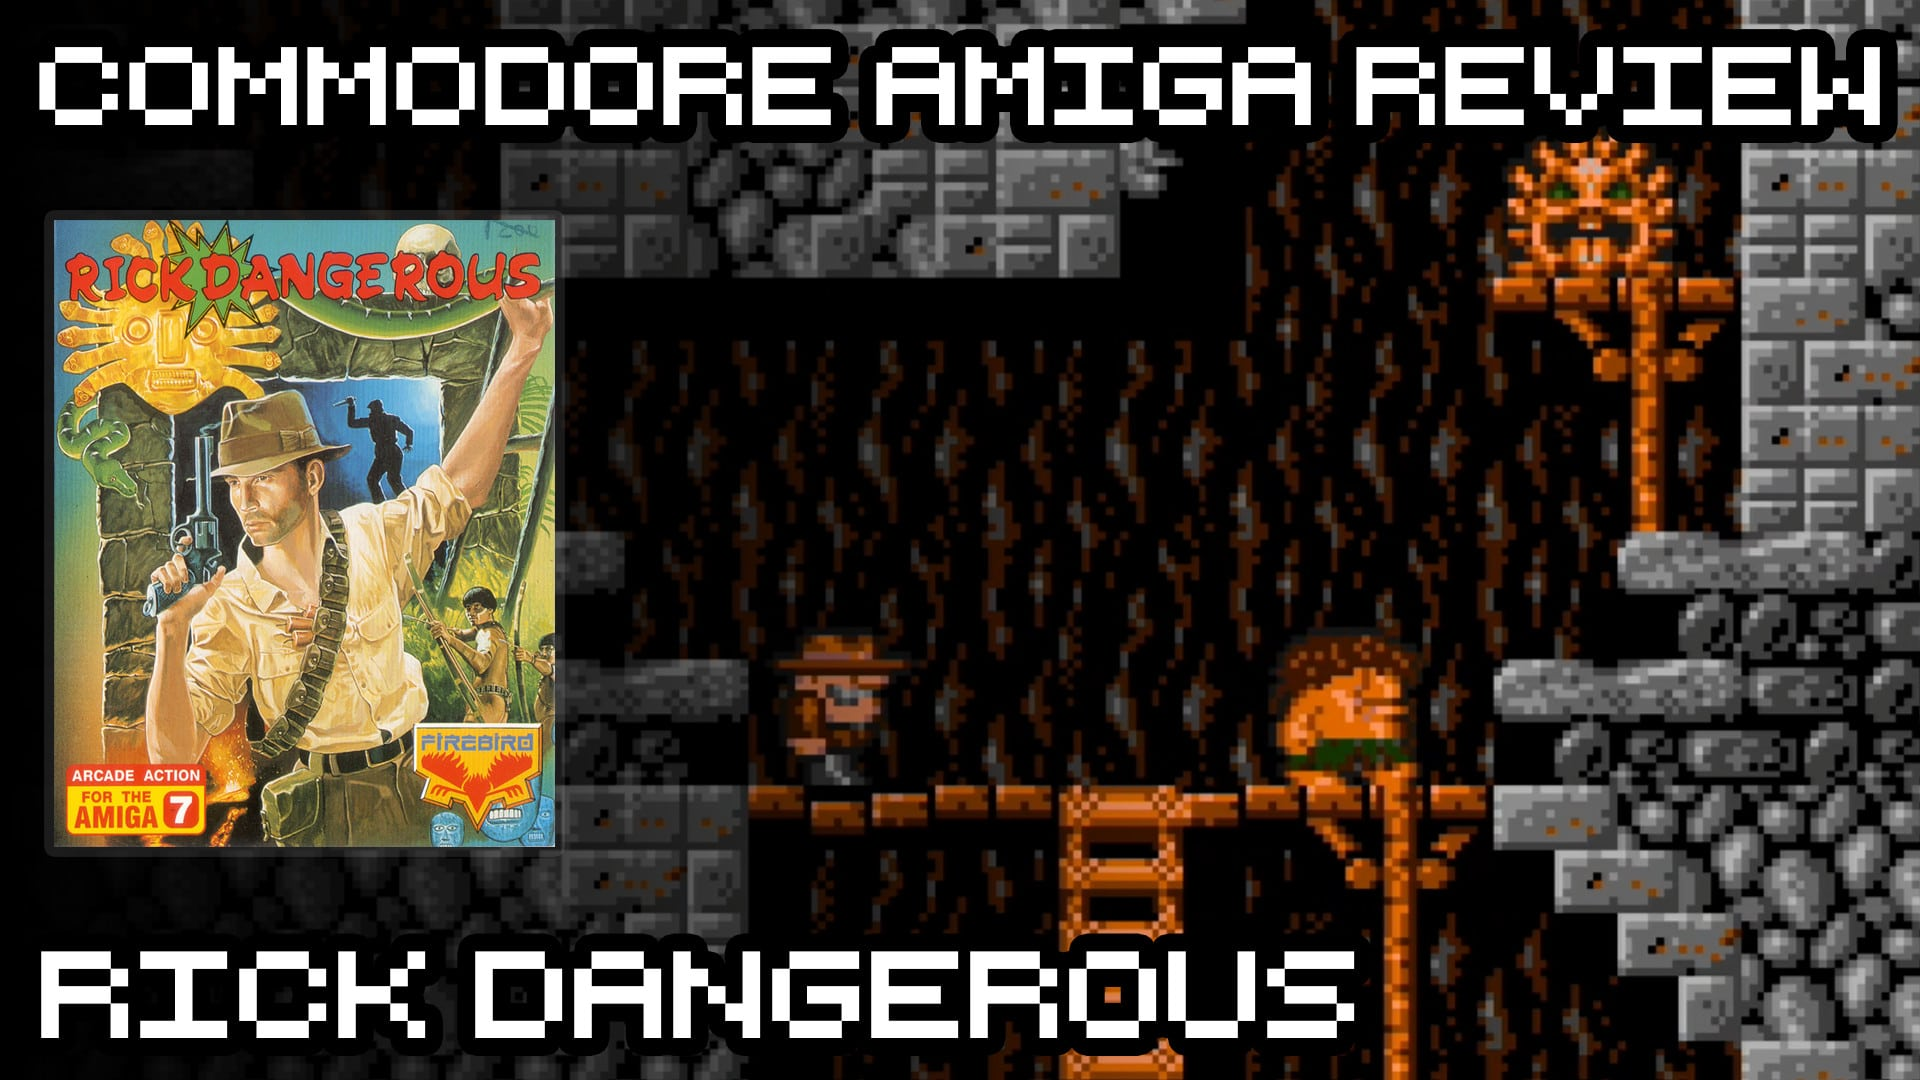 Rick Dangerous – Commodore Amiga Review